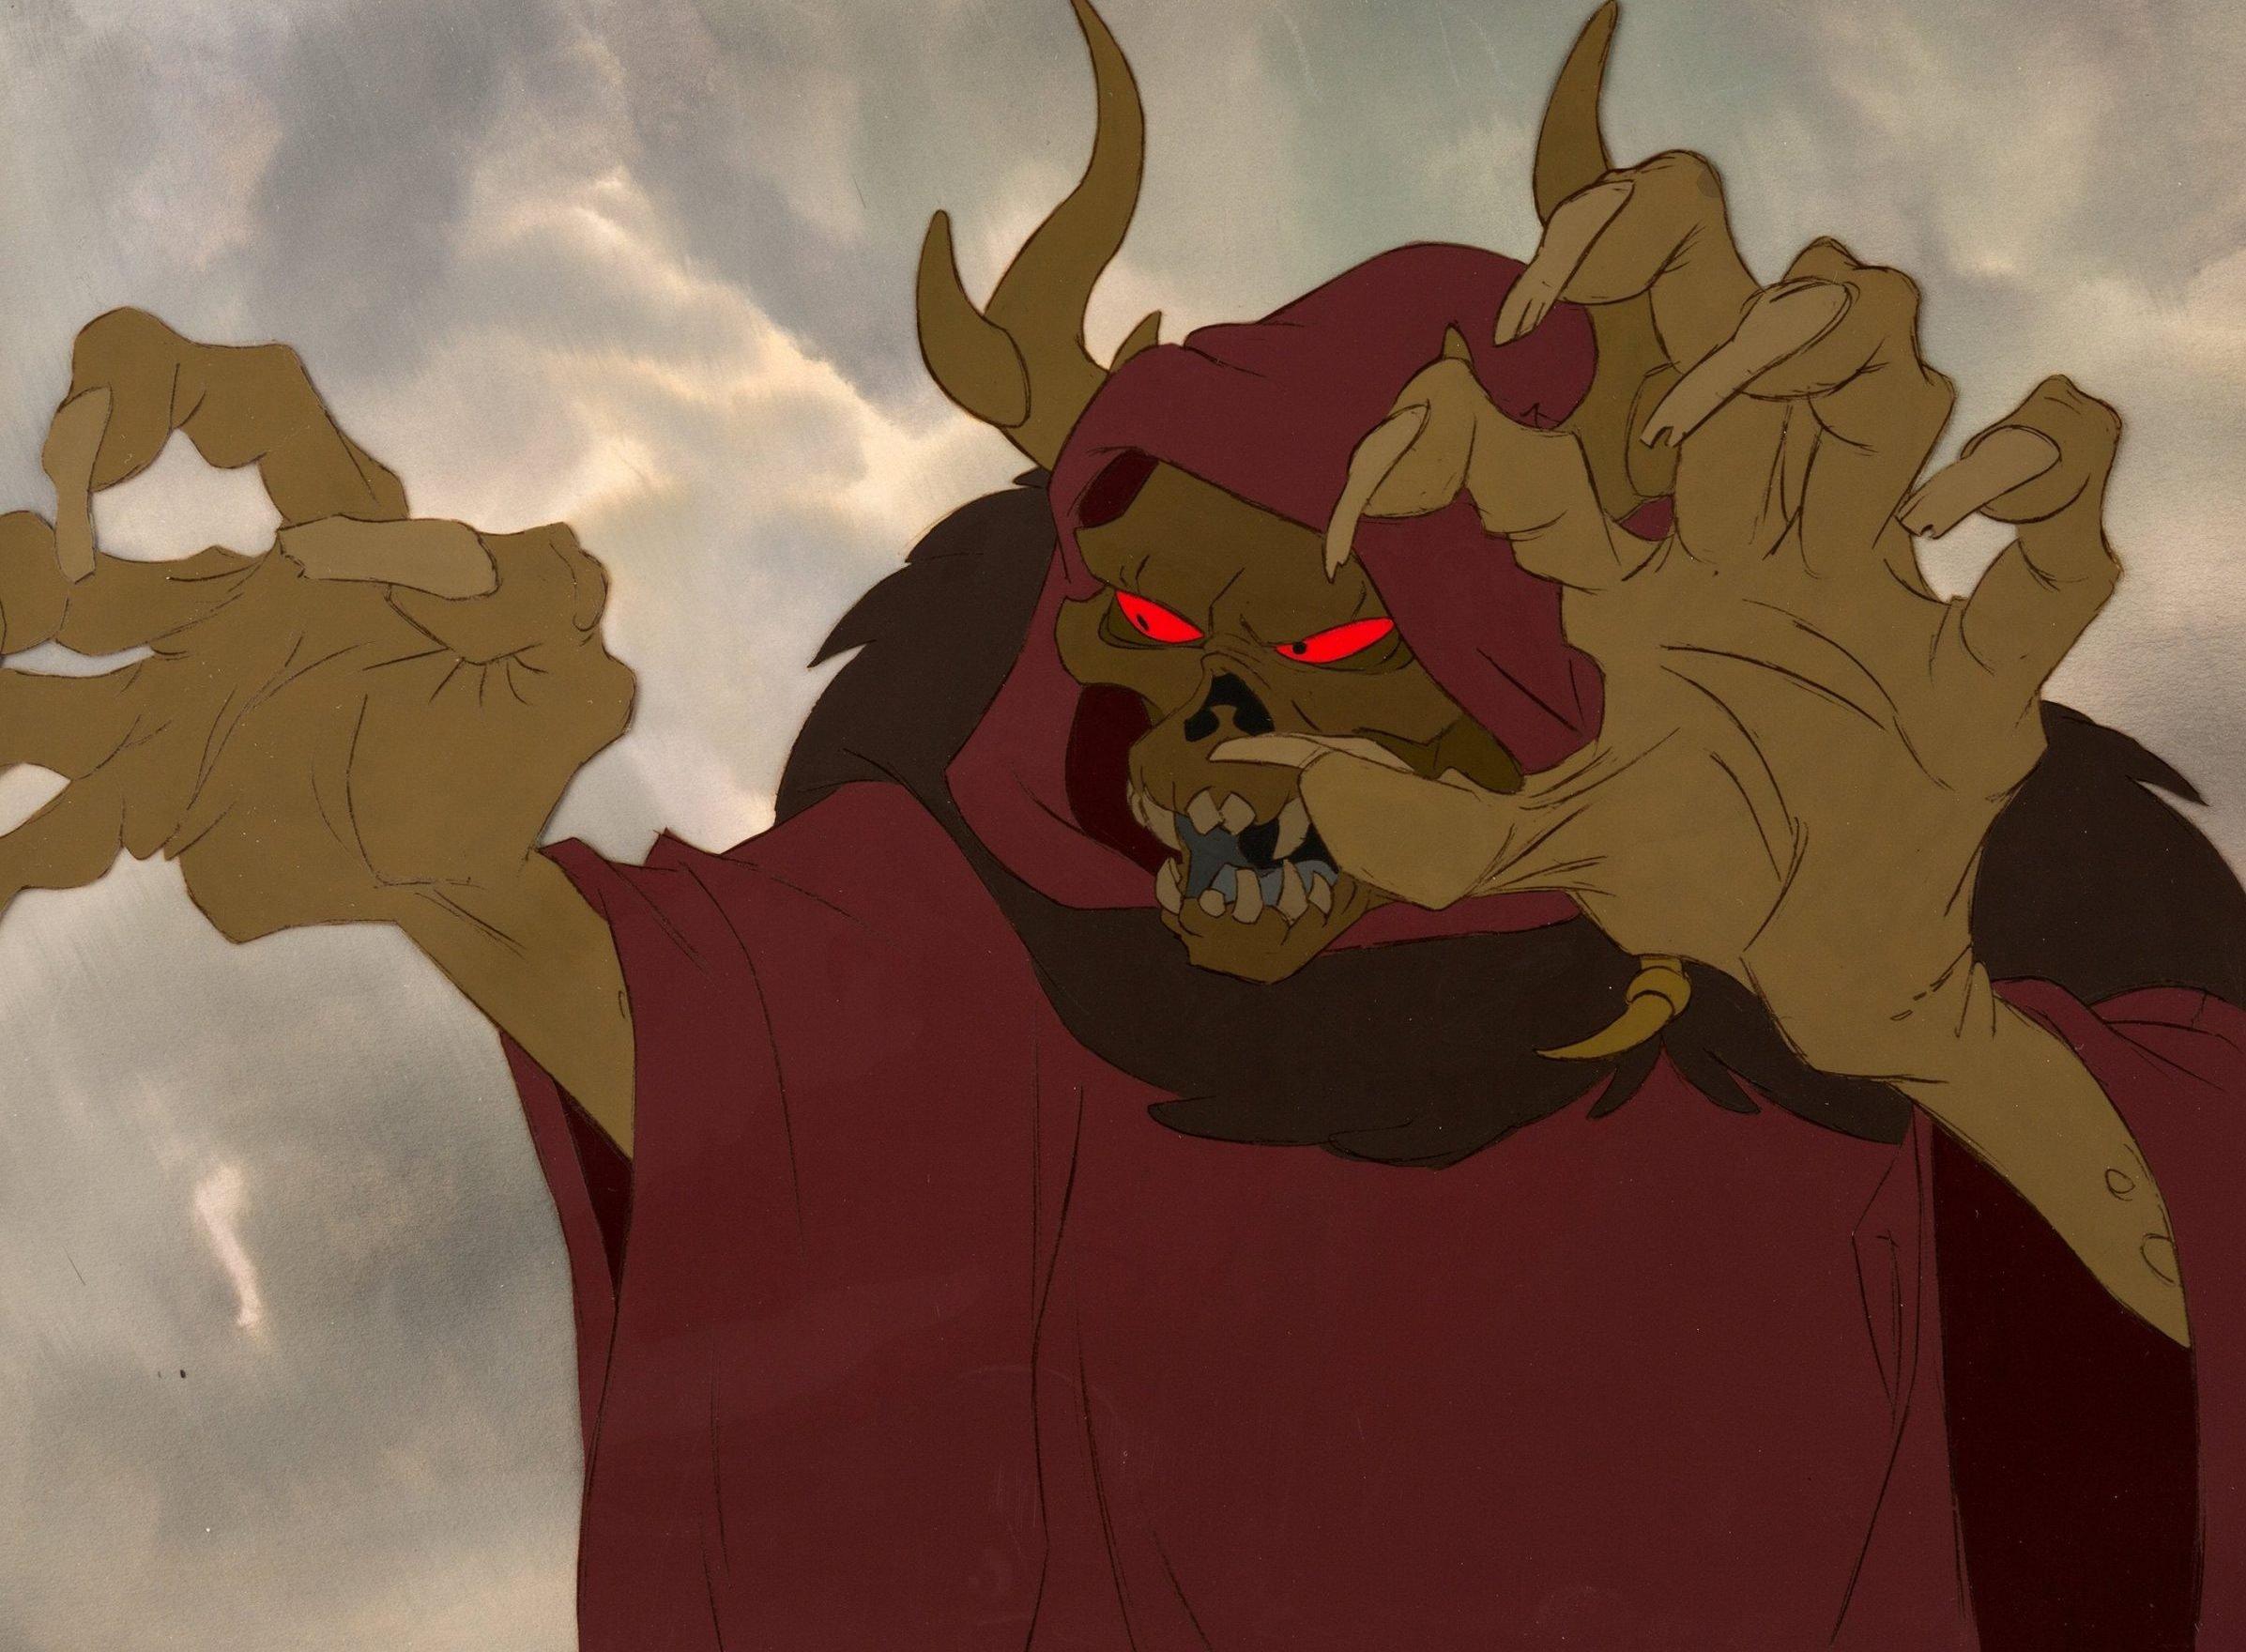 Horned King Black Cauldron scaled e1631869970243 The Black Cauldron: 20 Facts About Disney's Biggest Box Office Bomb